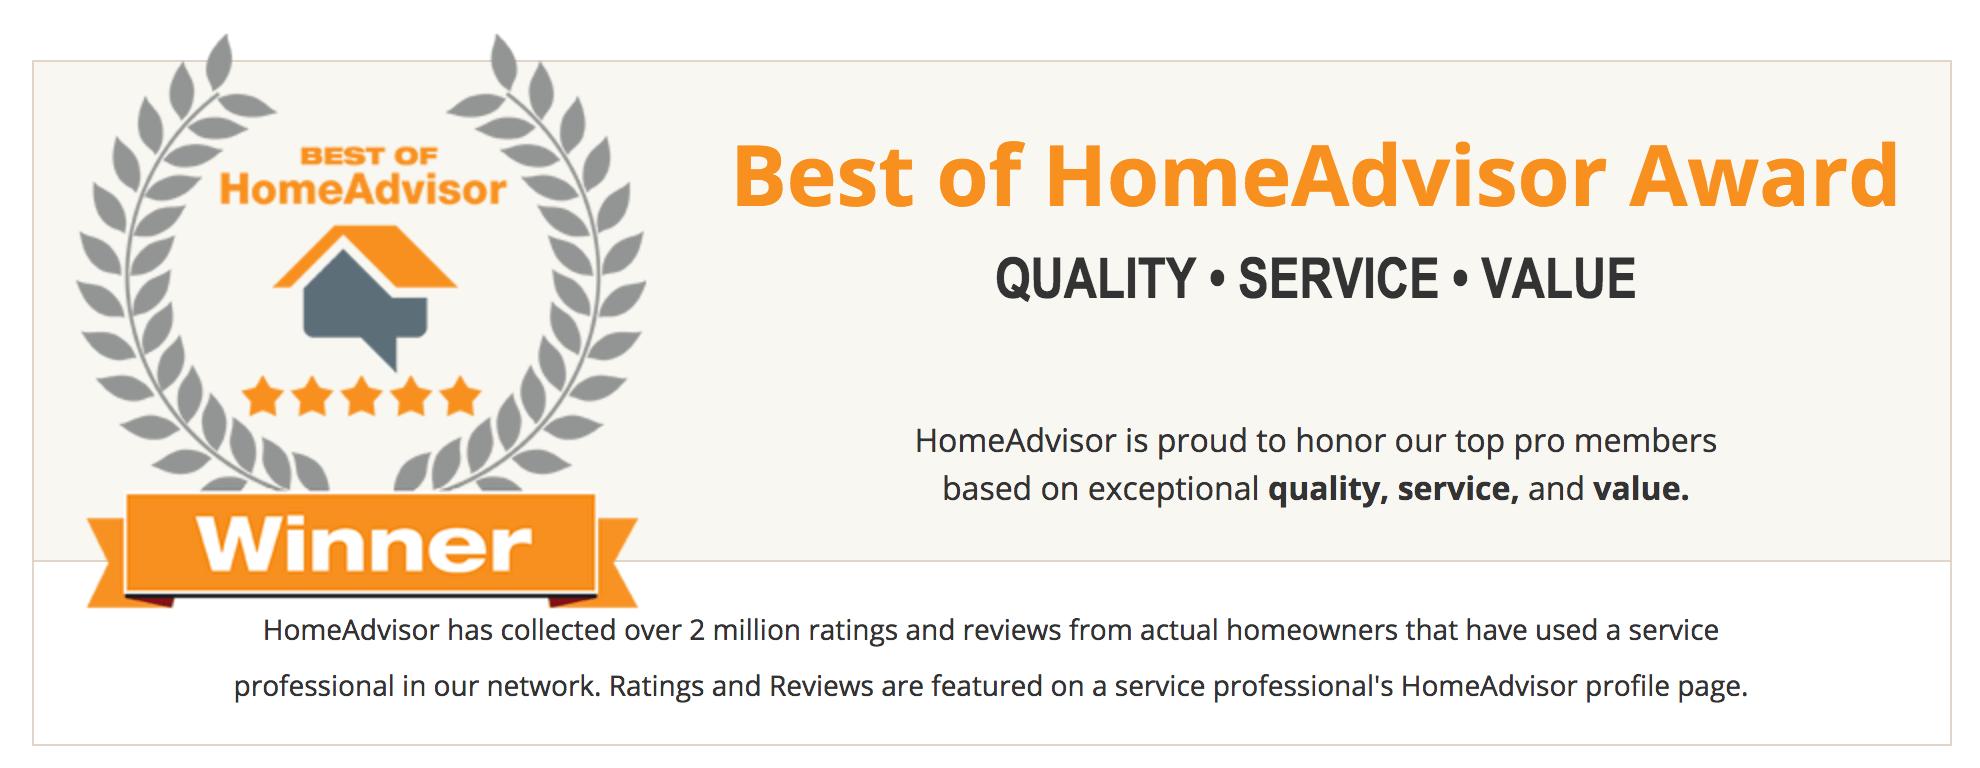 Best Of Homeadvisor 2017 Award Winner Jersey Steamer Cleaning Service